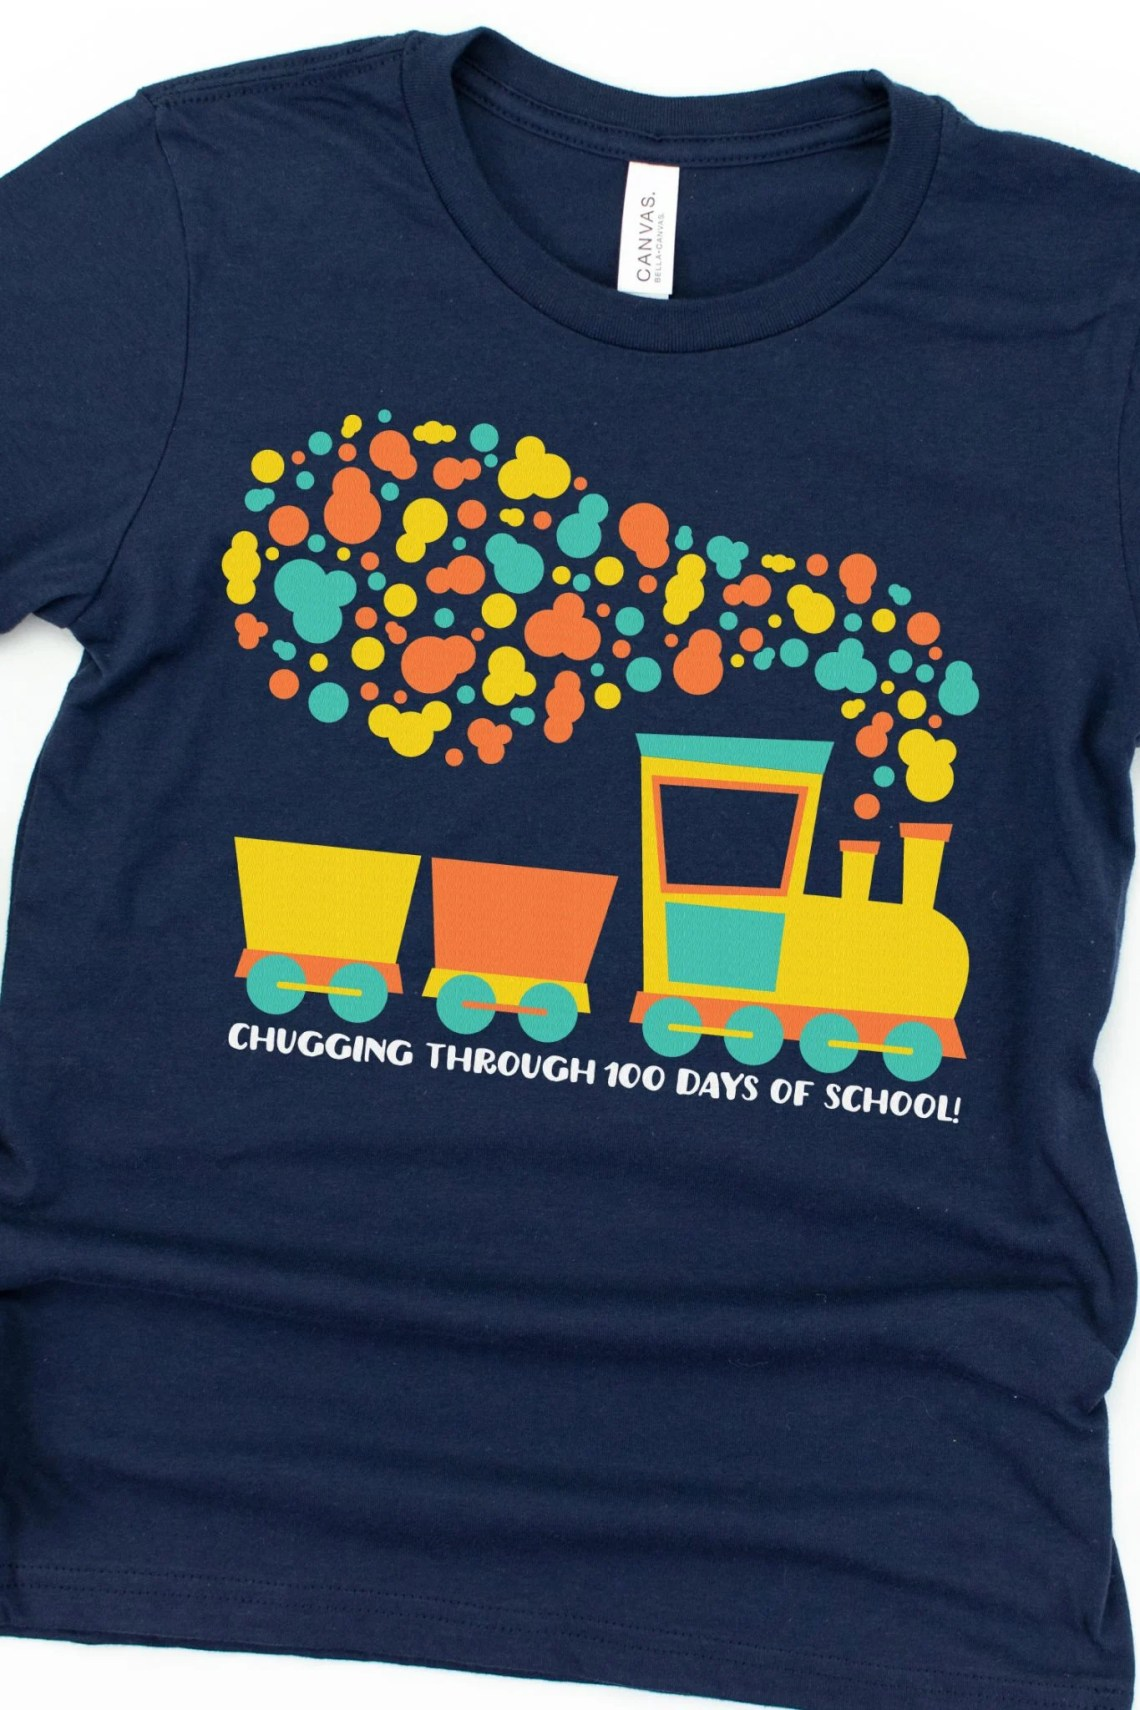 Download Crayon Clip Art - Free Download - Hey, Let's Make Stuff